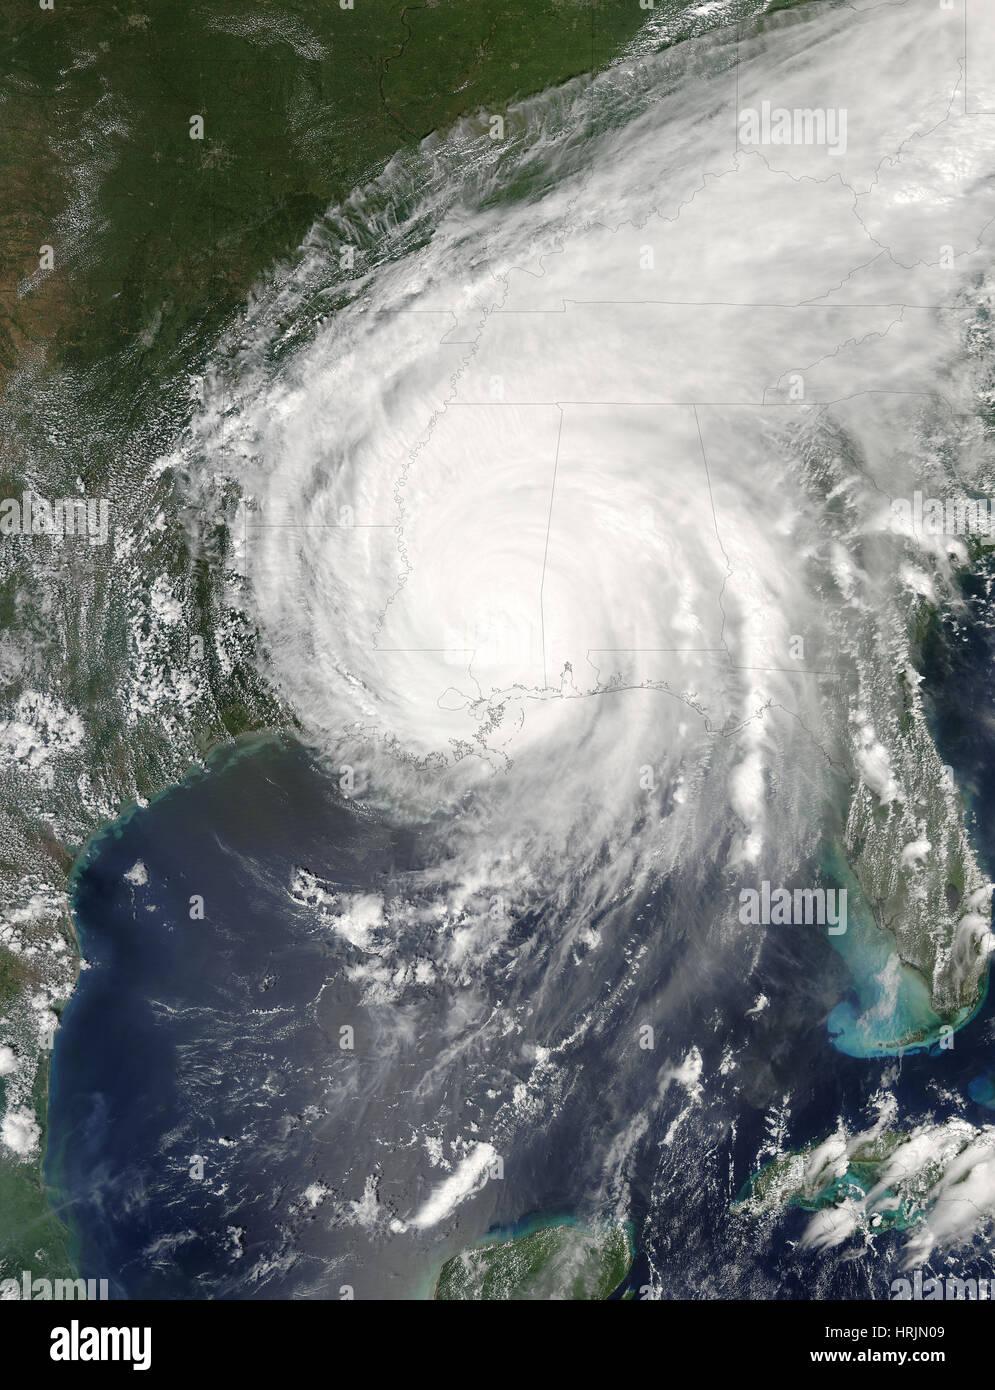 El huracán Katrina, el MODIS Imagen, 2005 Imagen De Stock